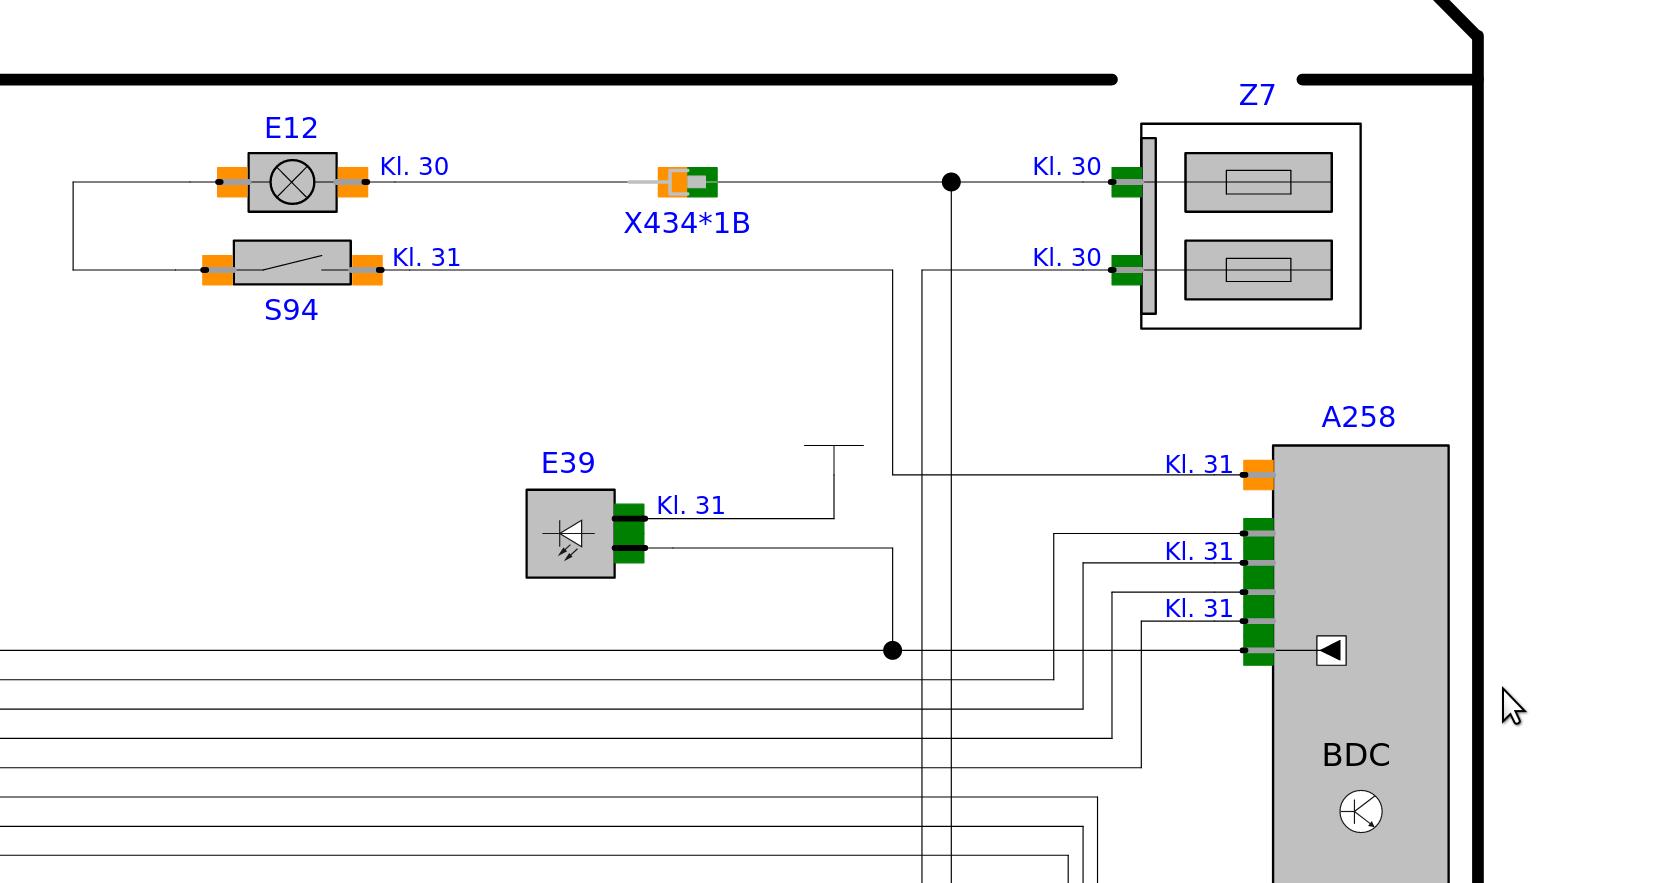 Screenshot-20200108-180110.png